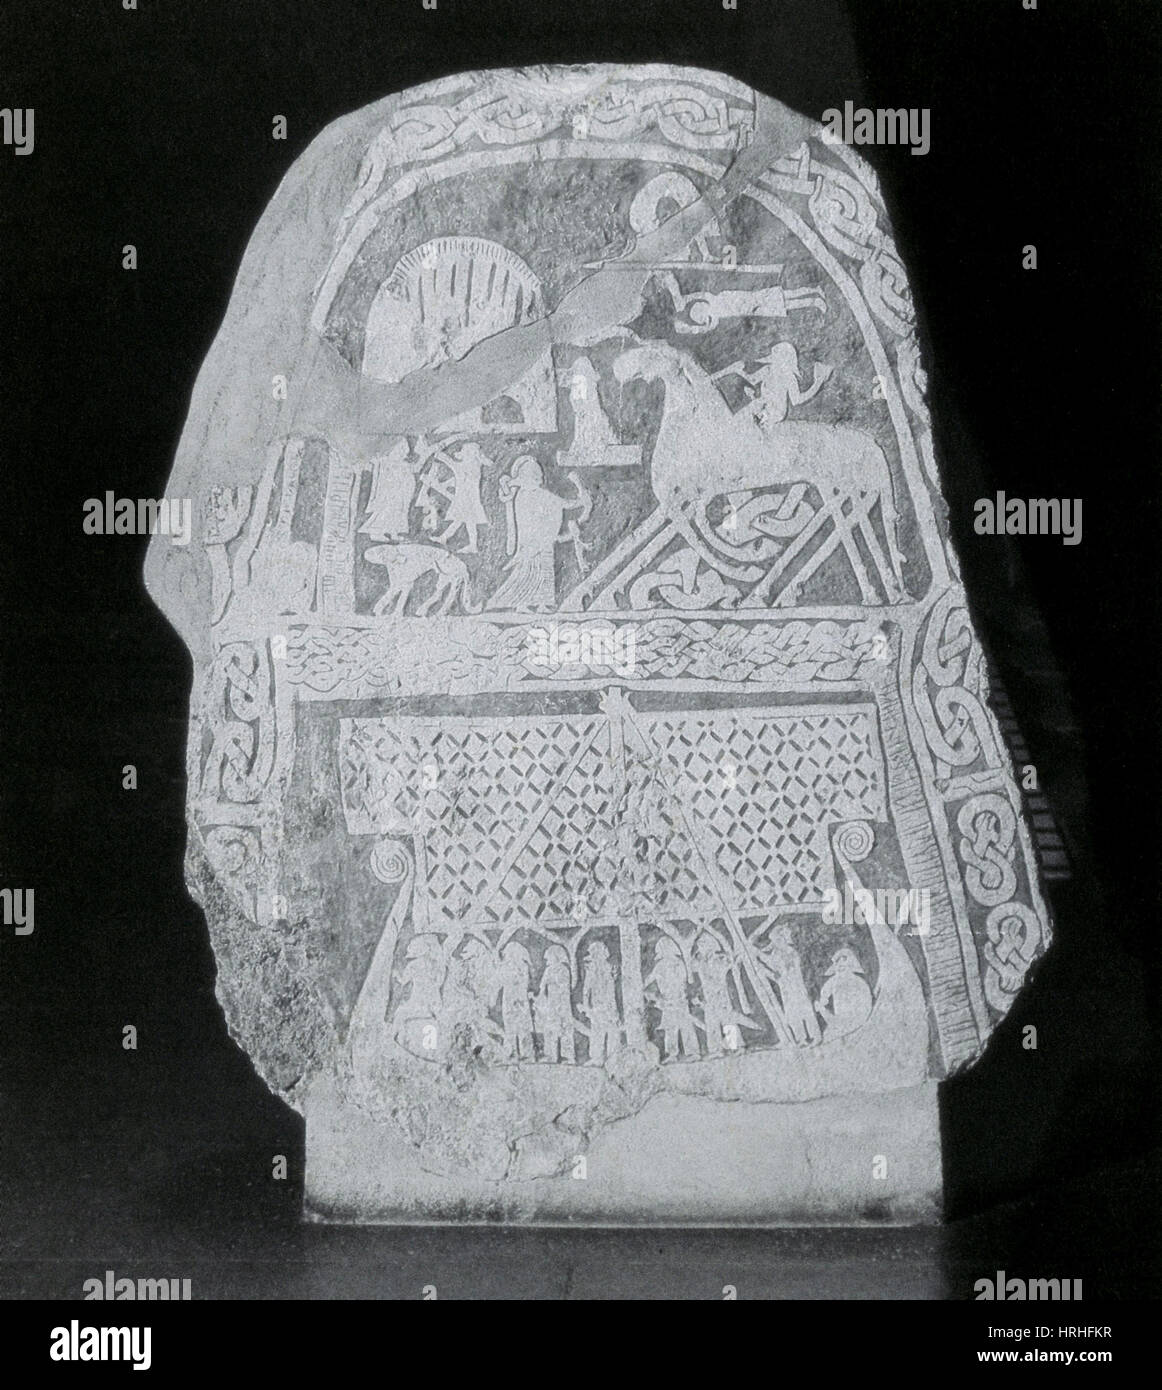 Stèle illustrant la mythologie nordique Photo Stock